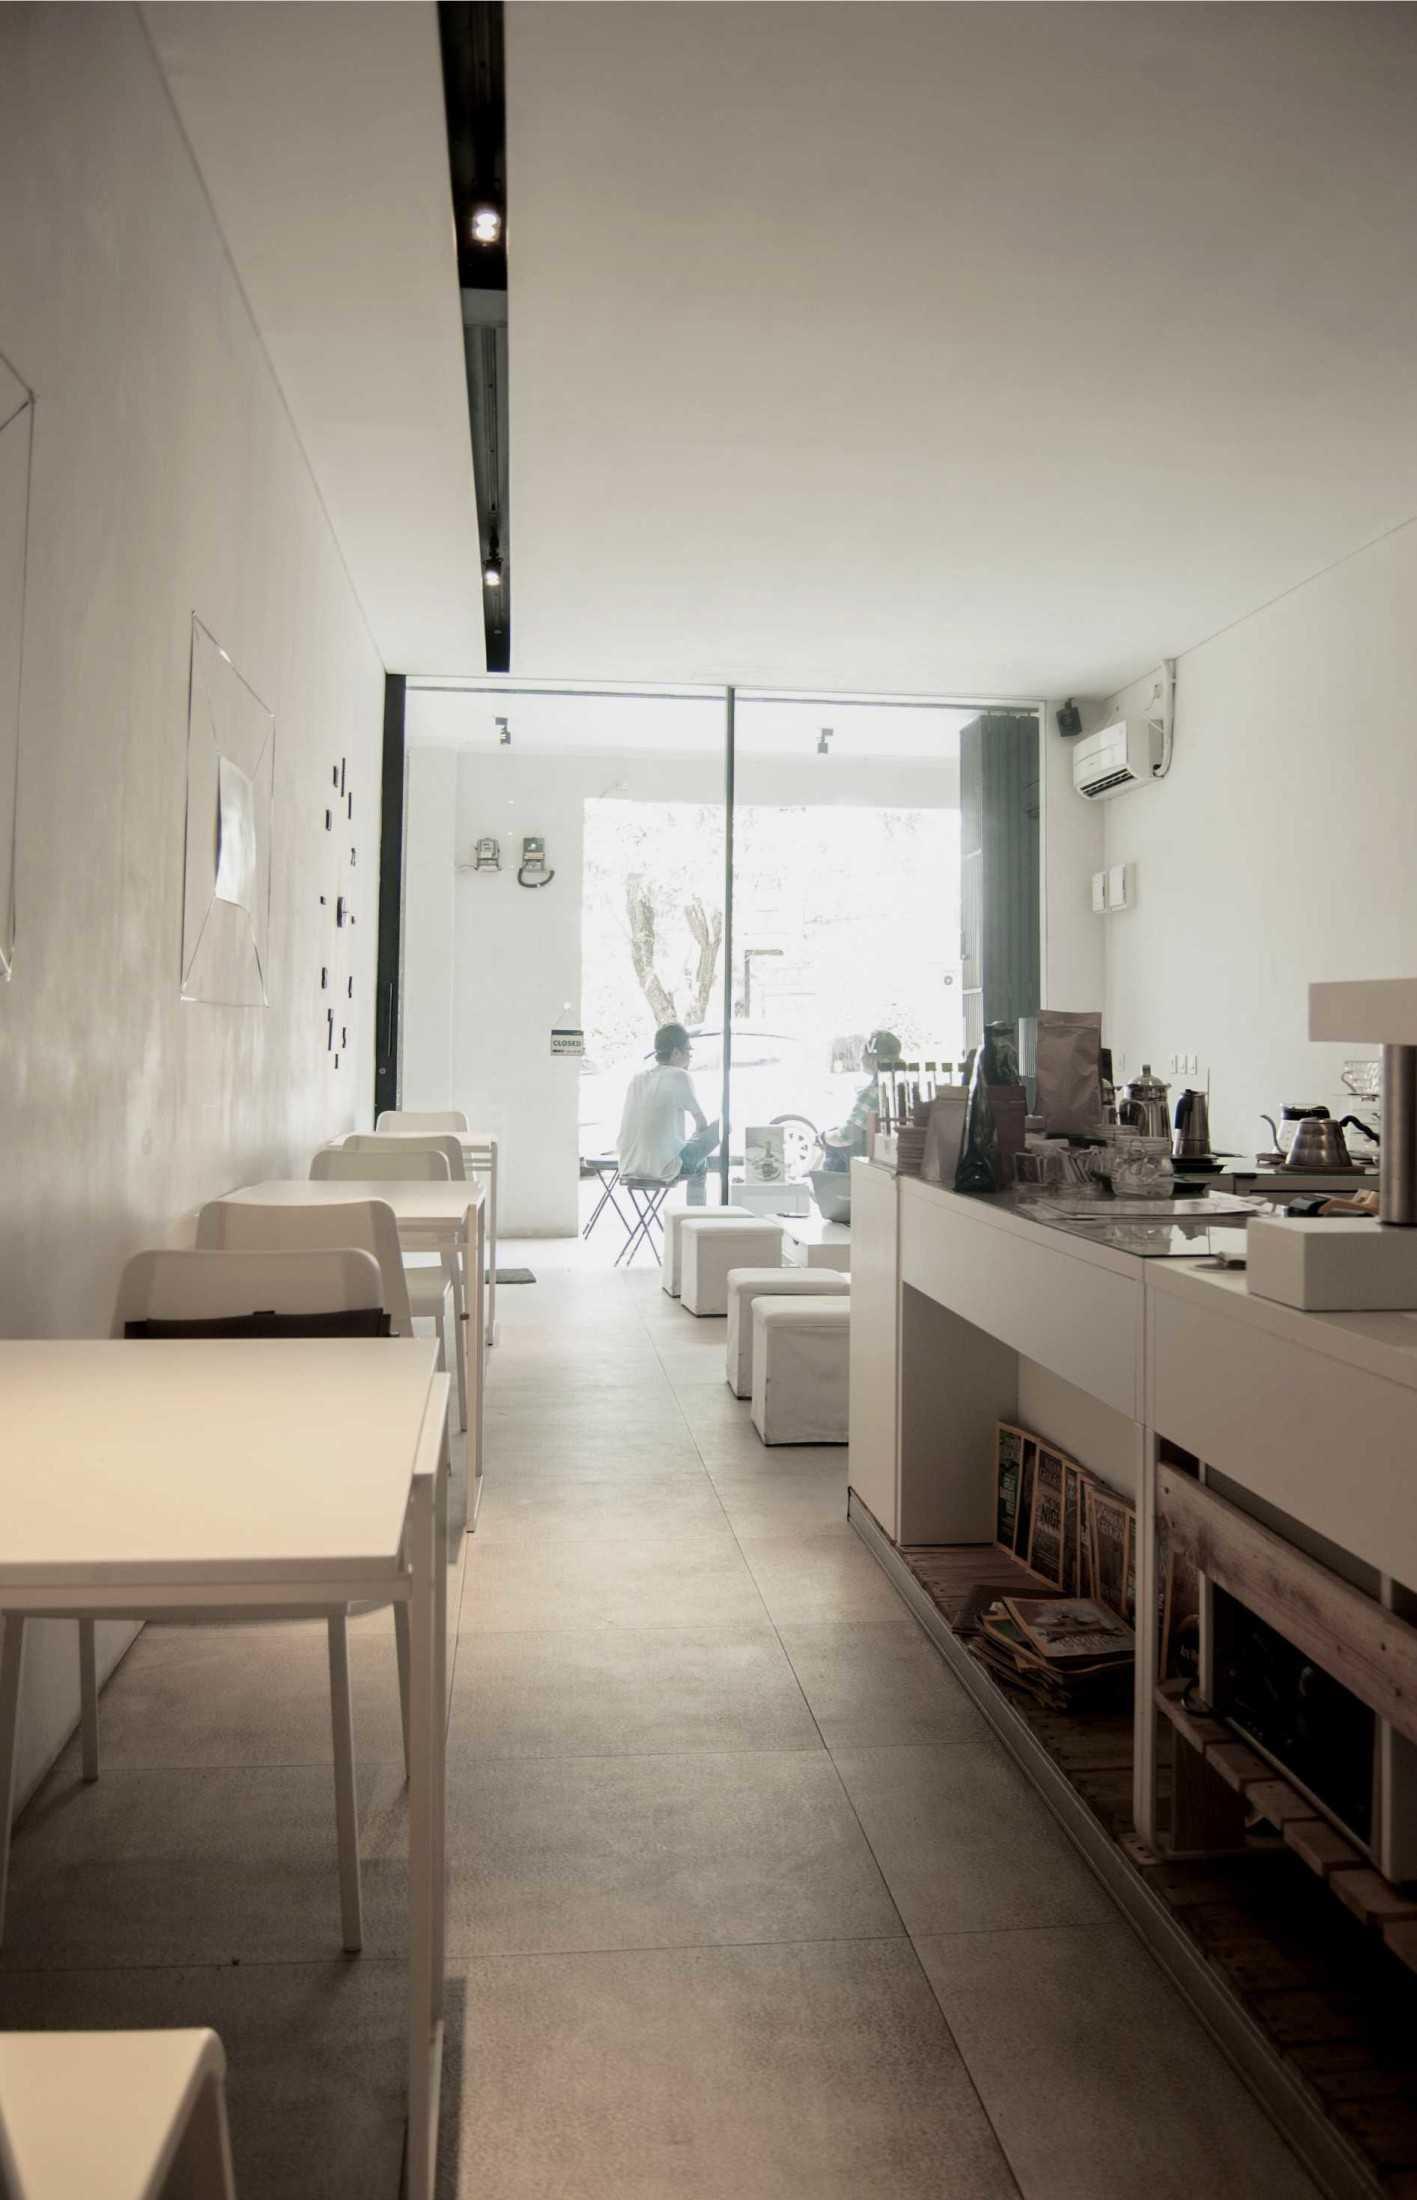 Ads Architect Kafe Kotak Putih Sentul Selatan Sentul Selatan Ads-Architect-Kafe-Kotak-Putih  53520